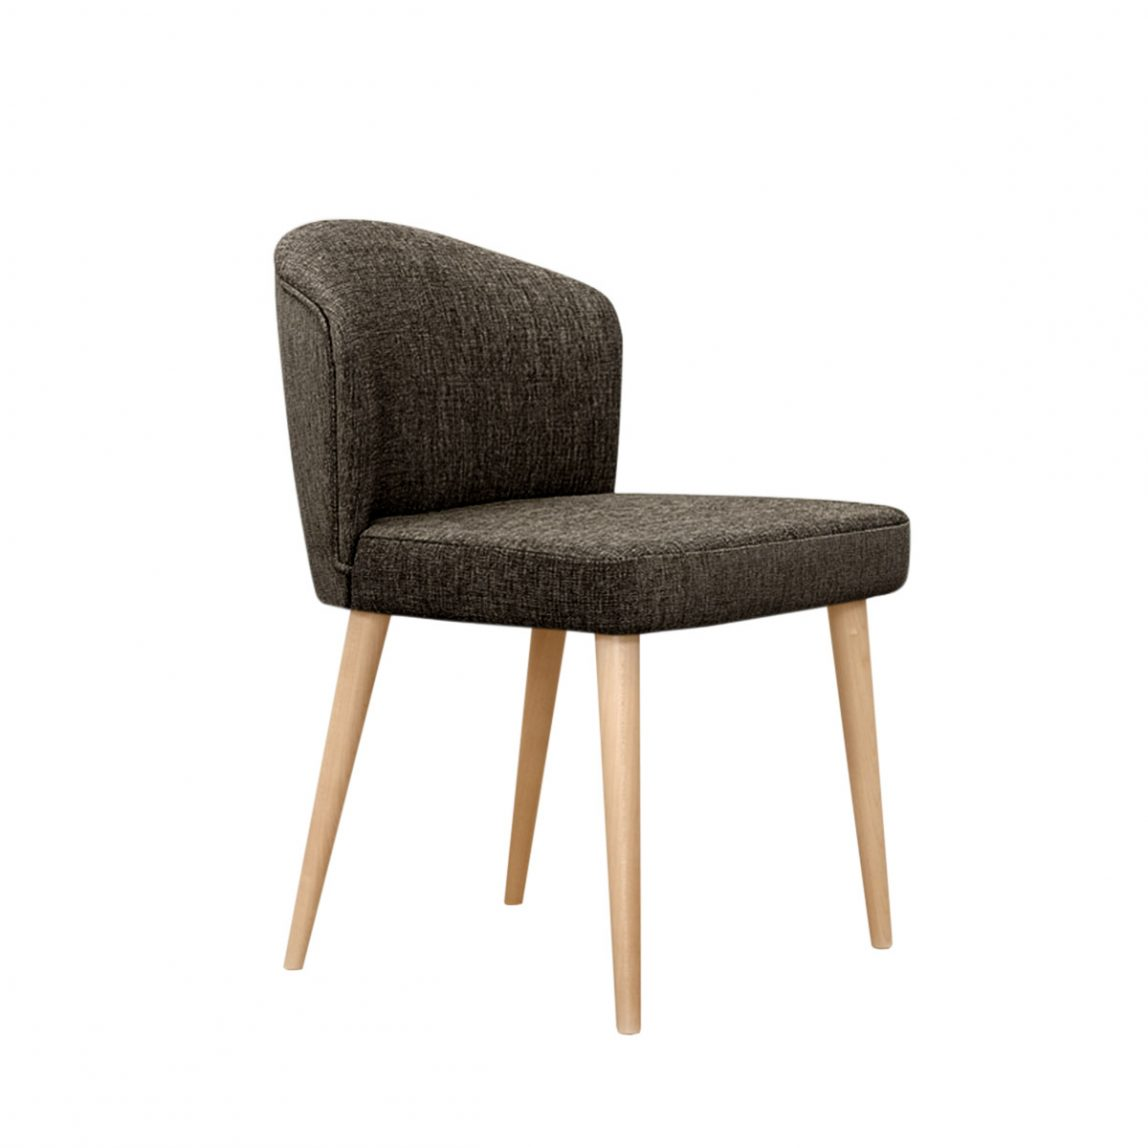 Современный стул Милс